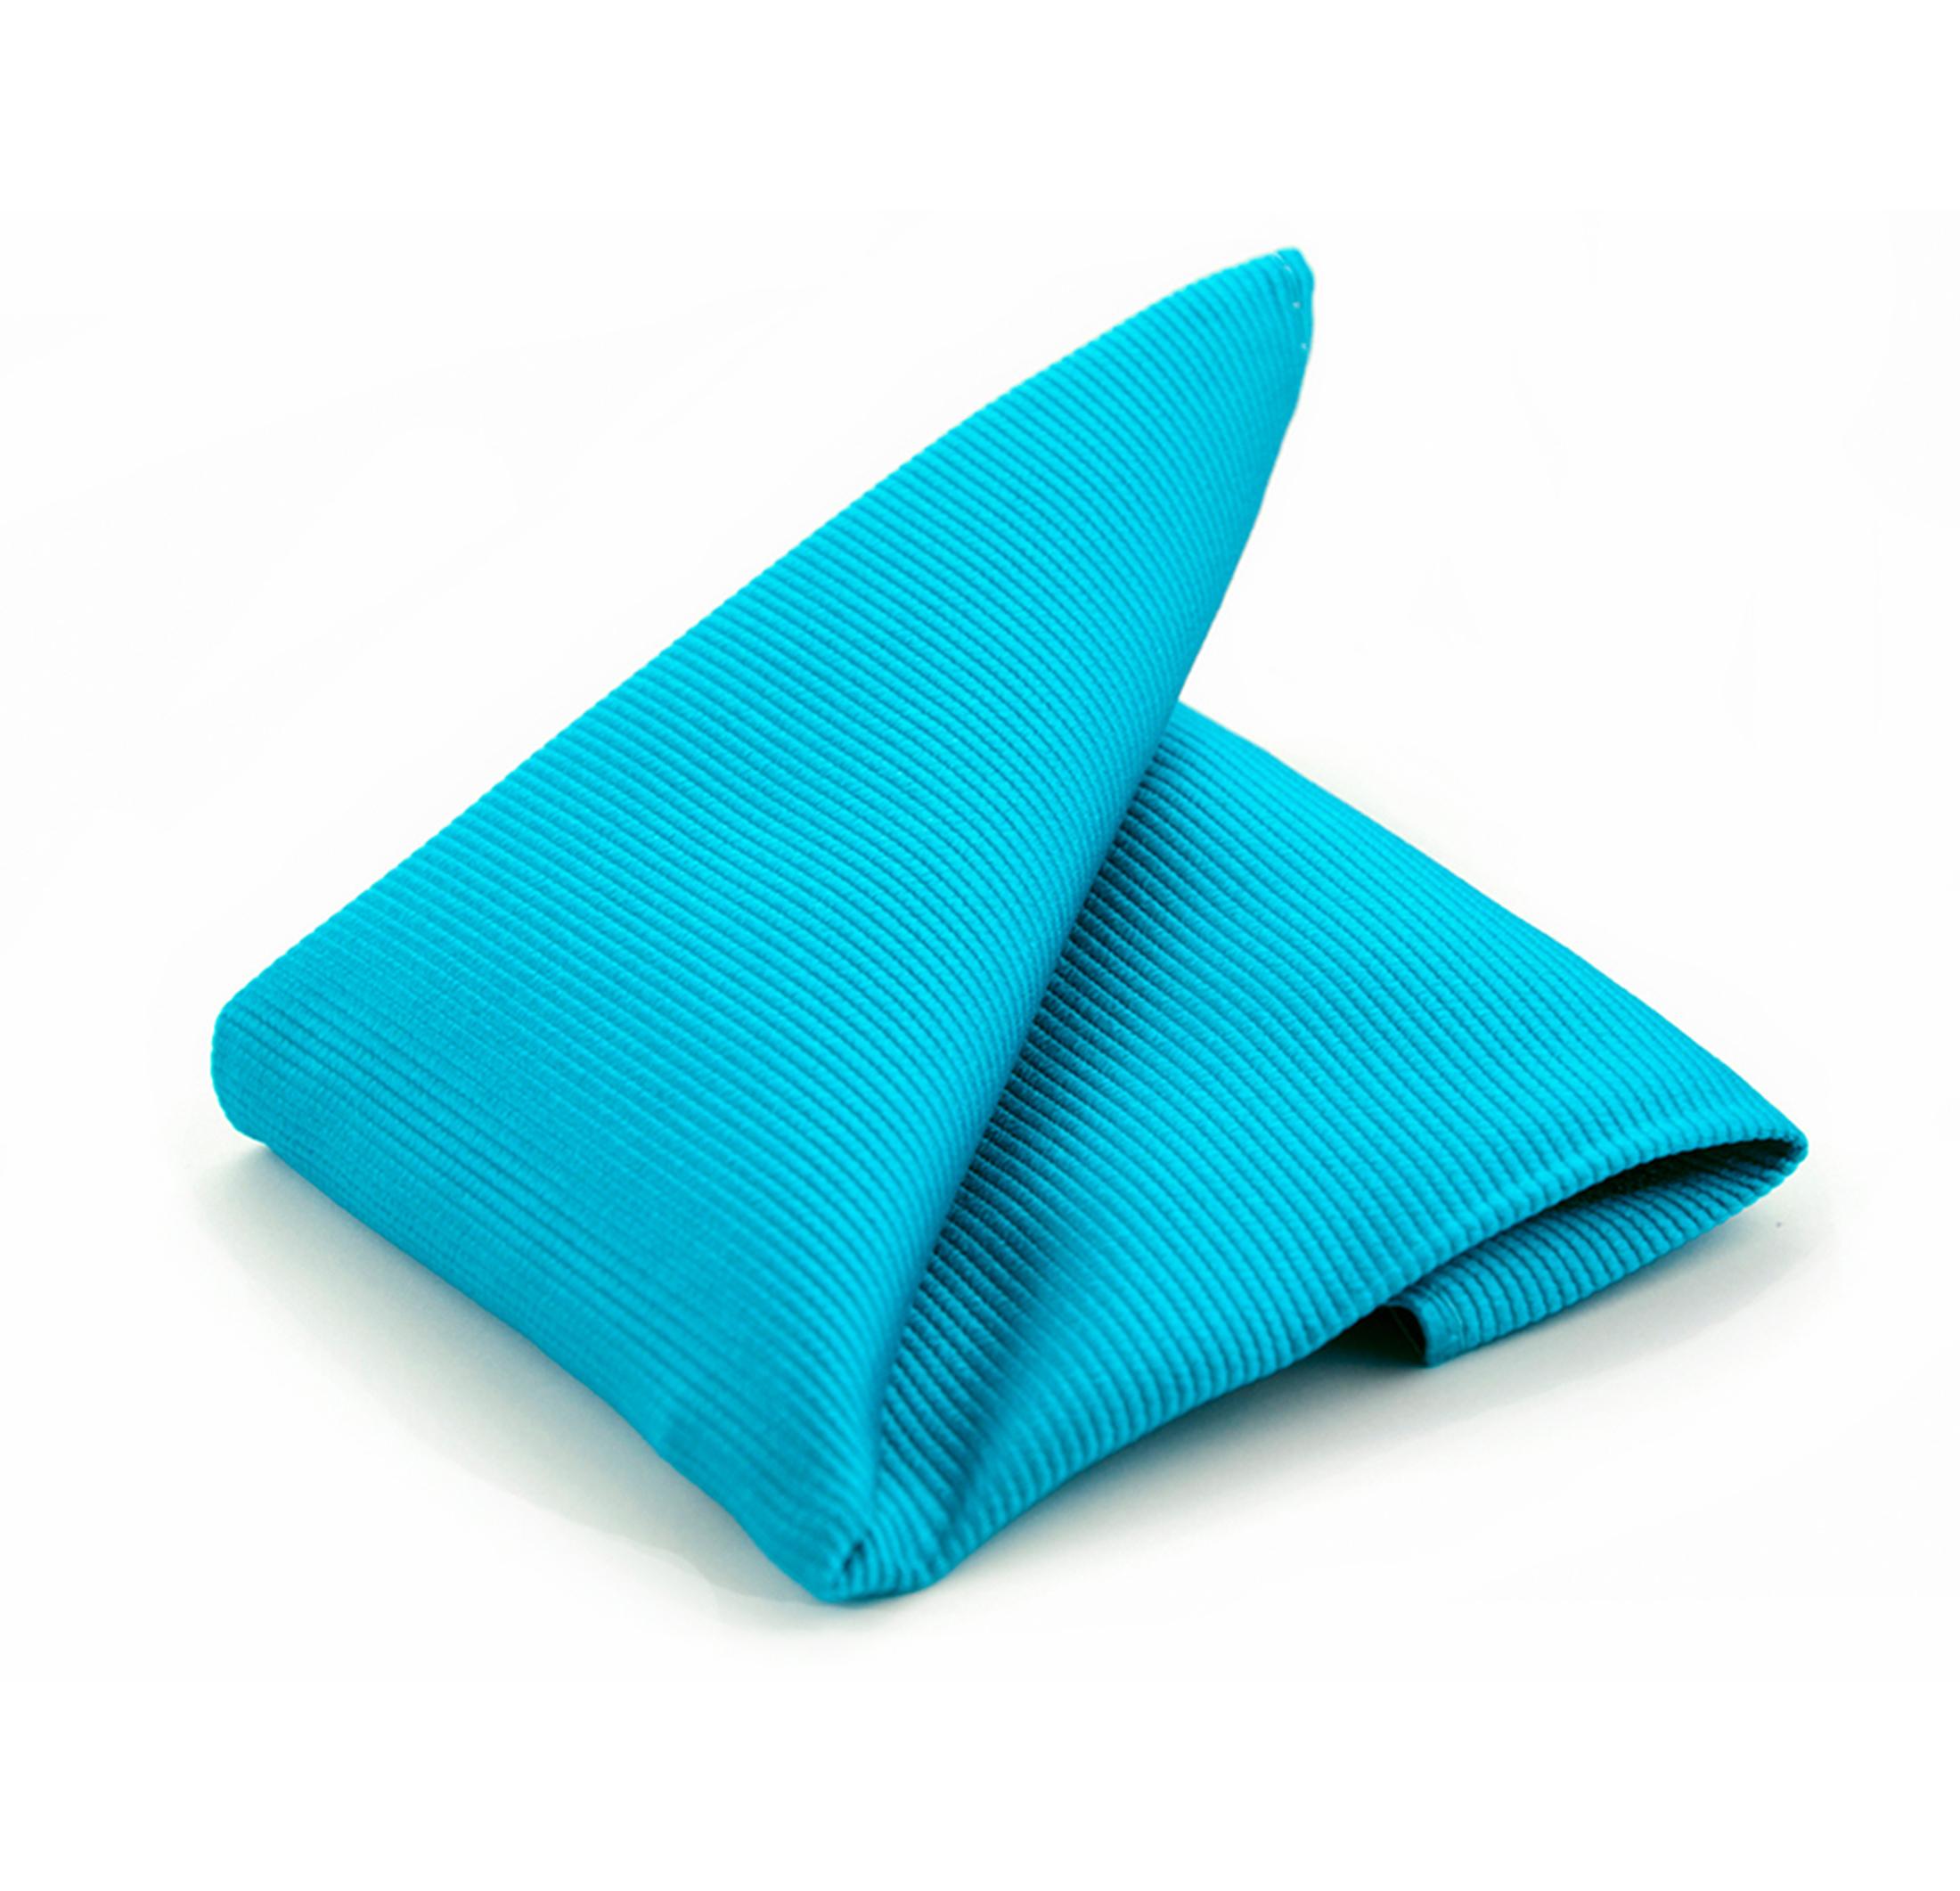 Einstecktuch Seide Aqua Blau F24